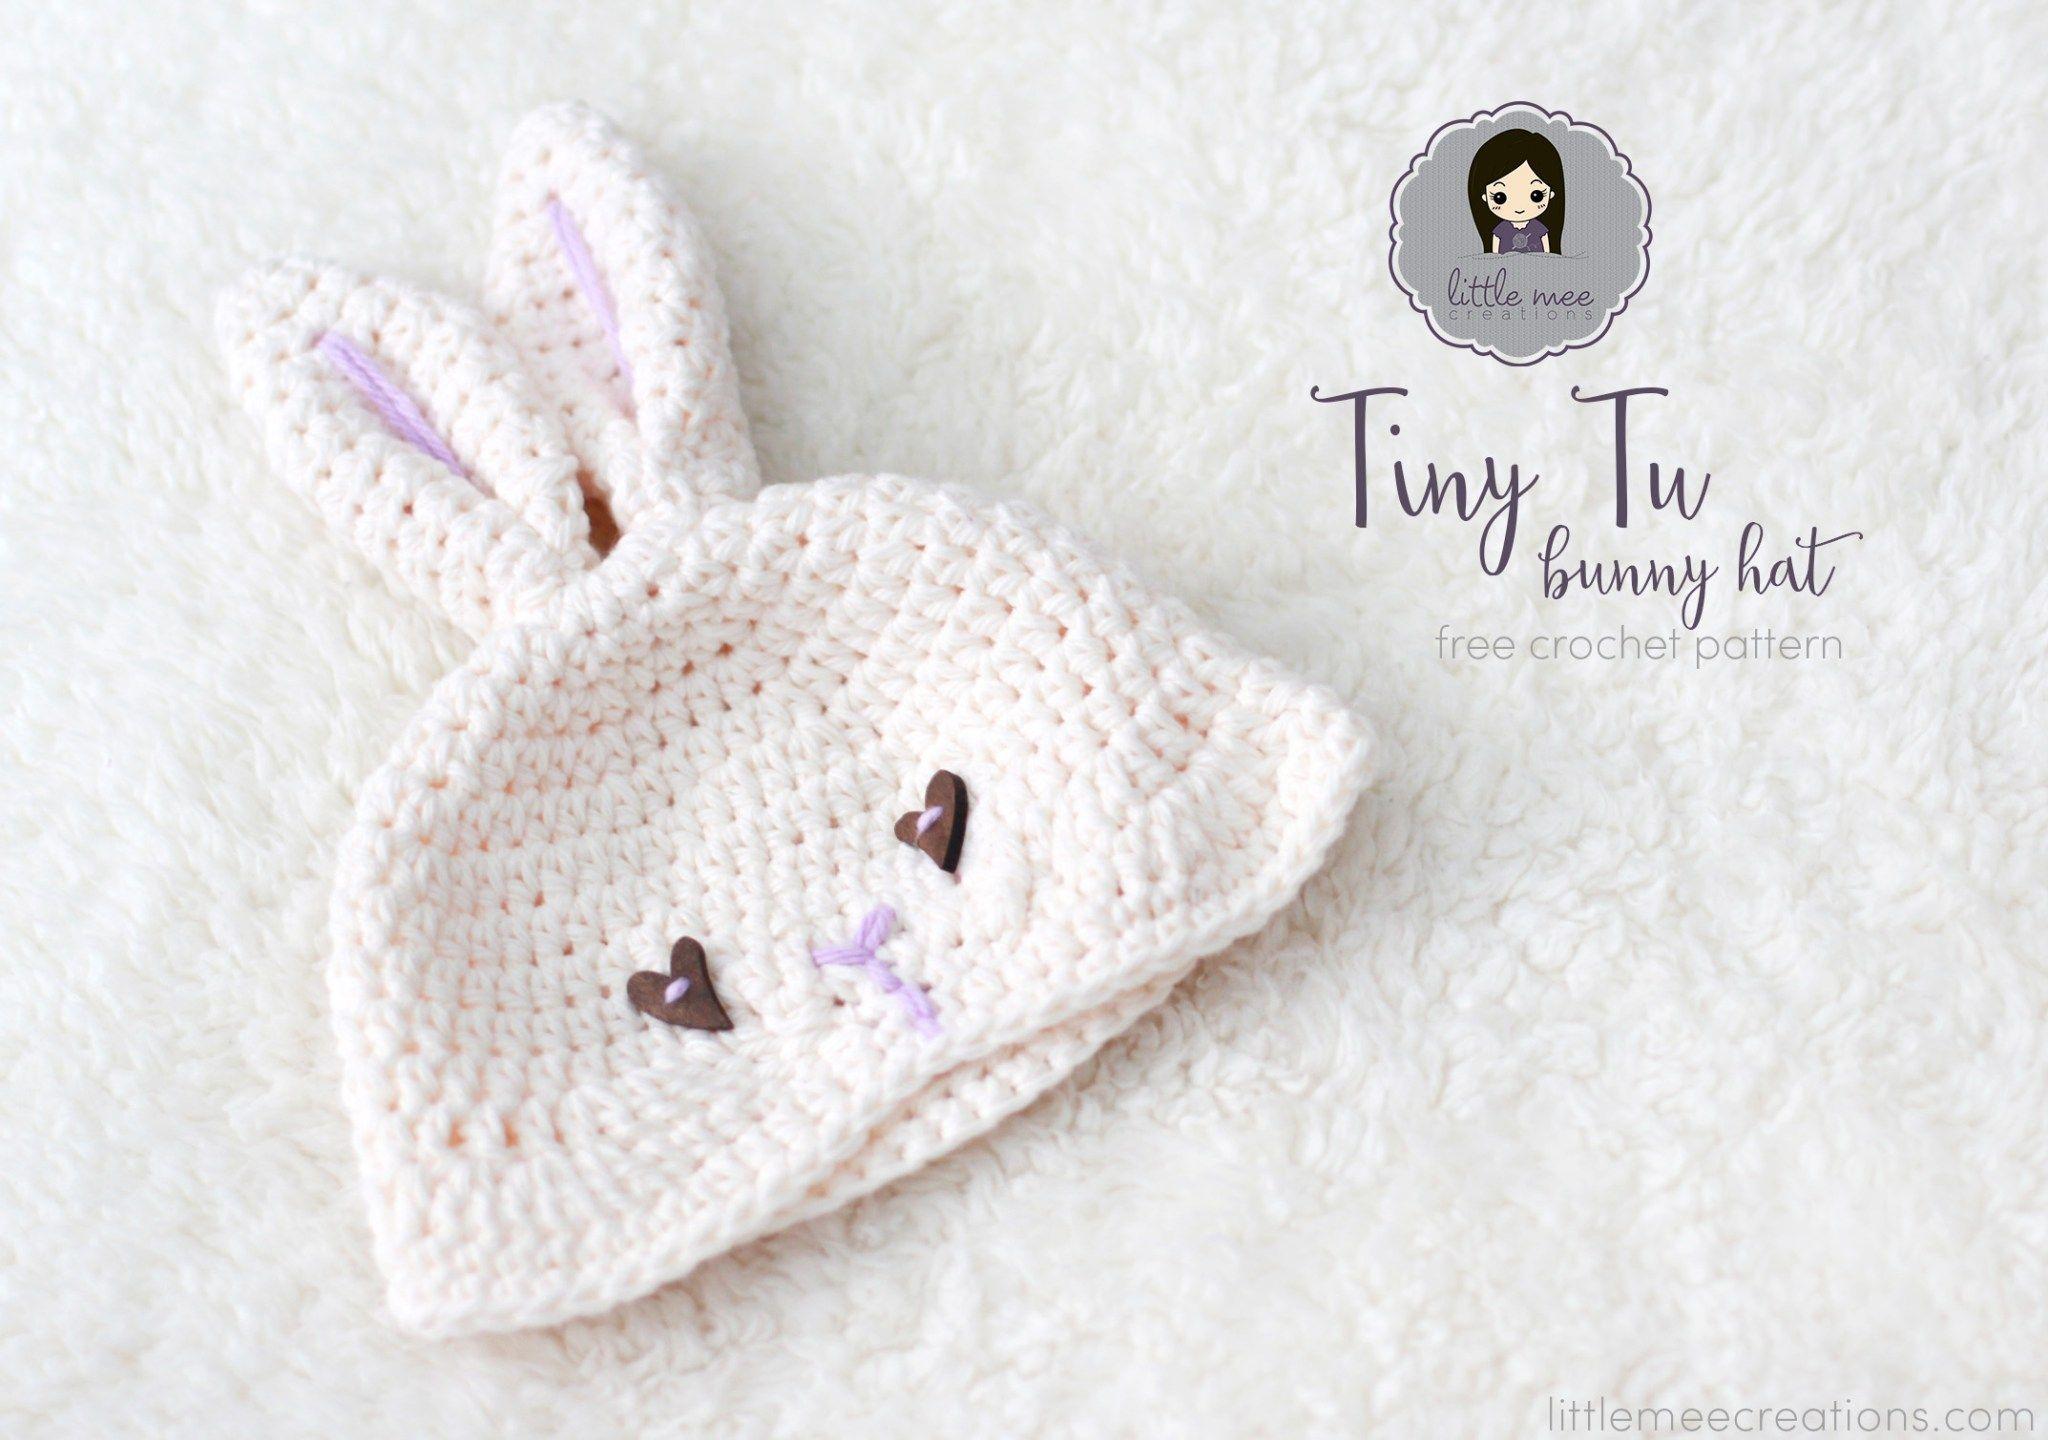 tiny tu bunny hat free crochet pattern by LittleMeeCreations ...